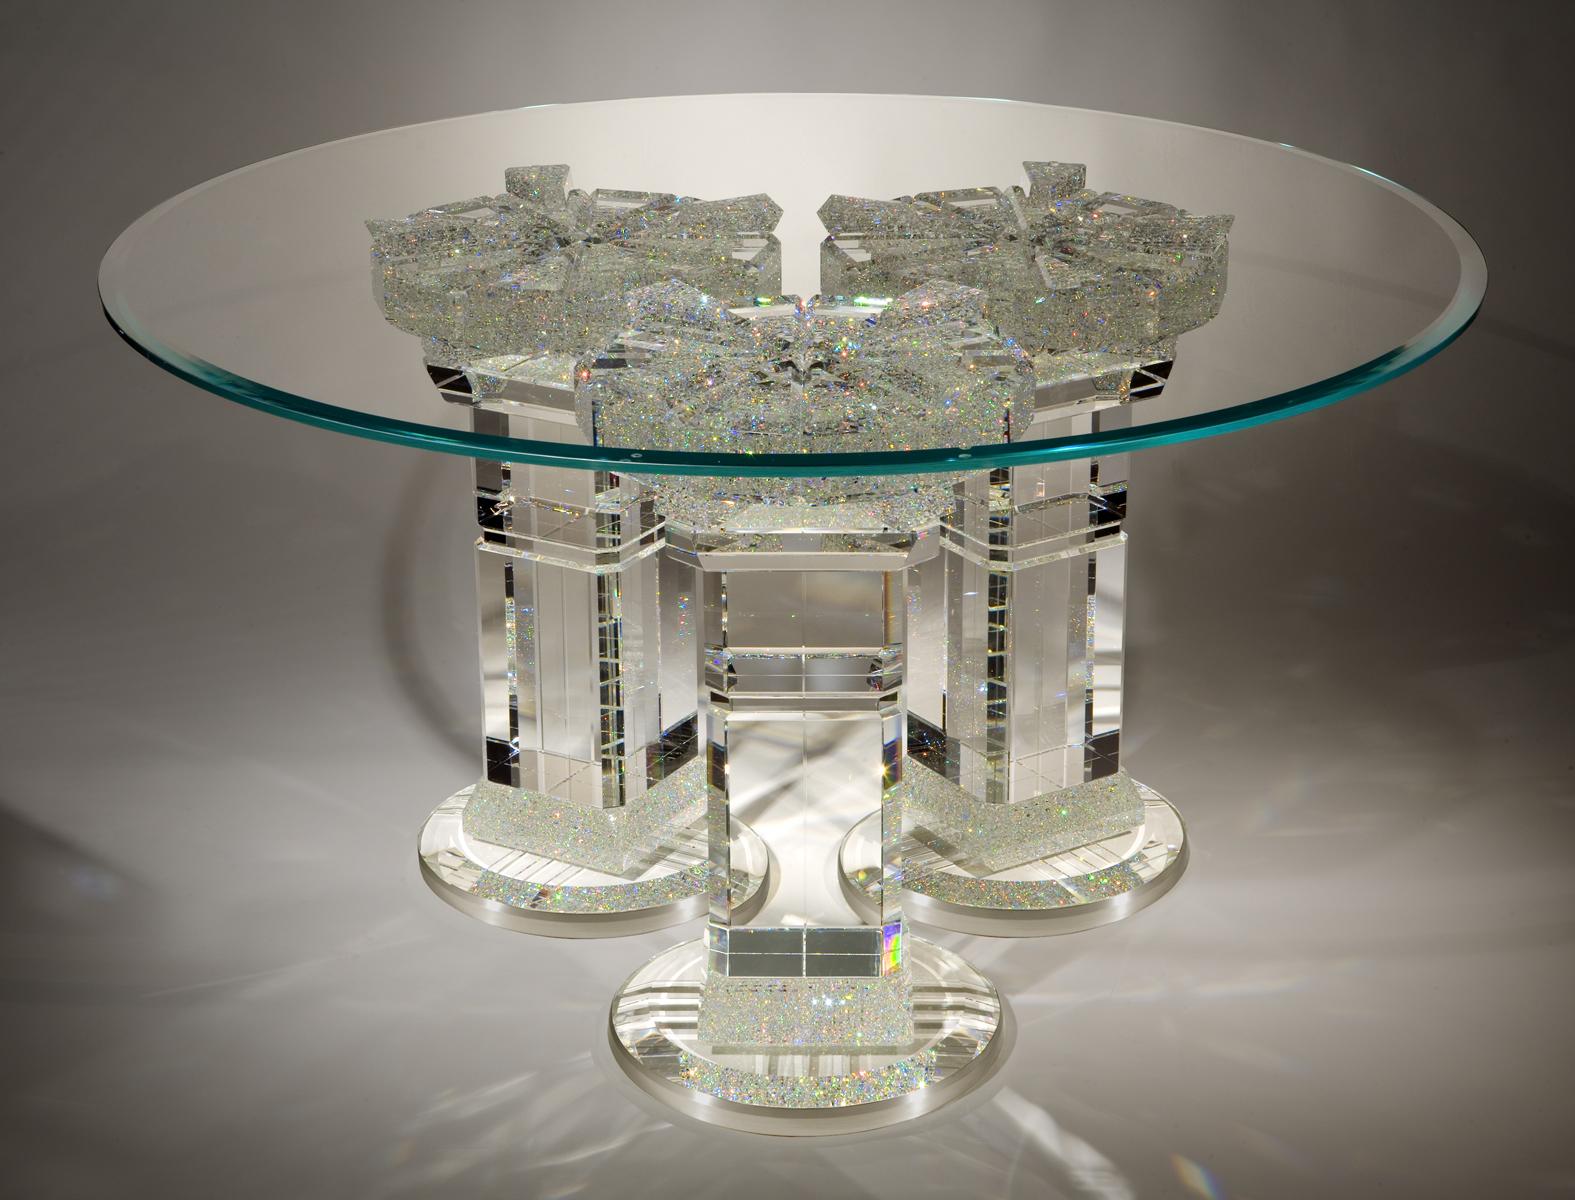 ... One Of Jon Kuhnu0027s Astonishingly Beautiful Crystal Tables ...